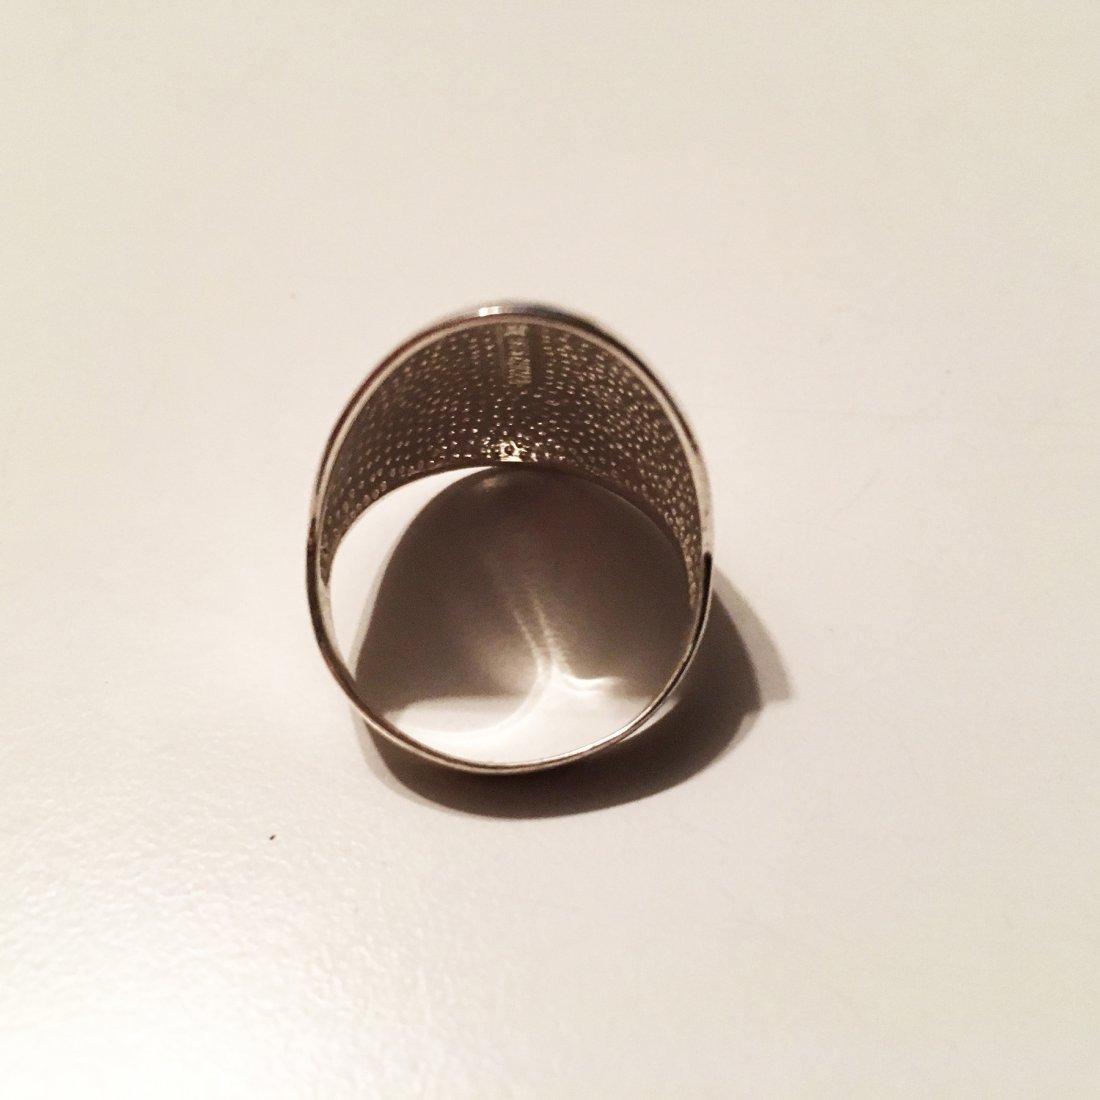 Impressive Sterling Silver Rings - 6